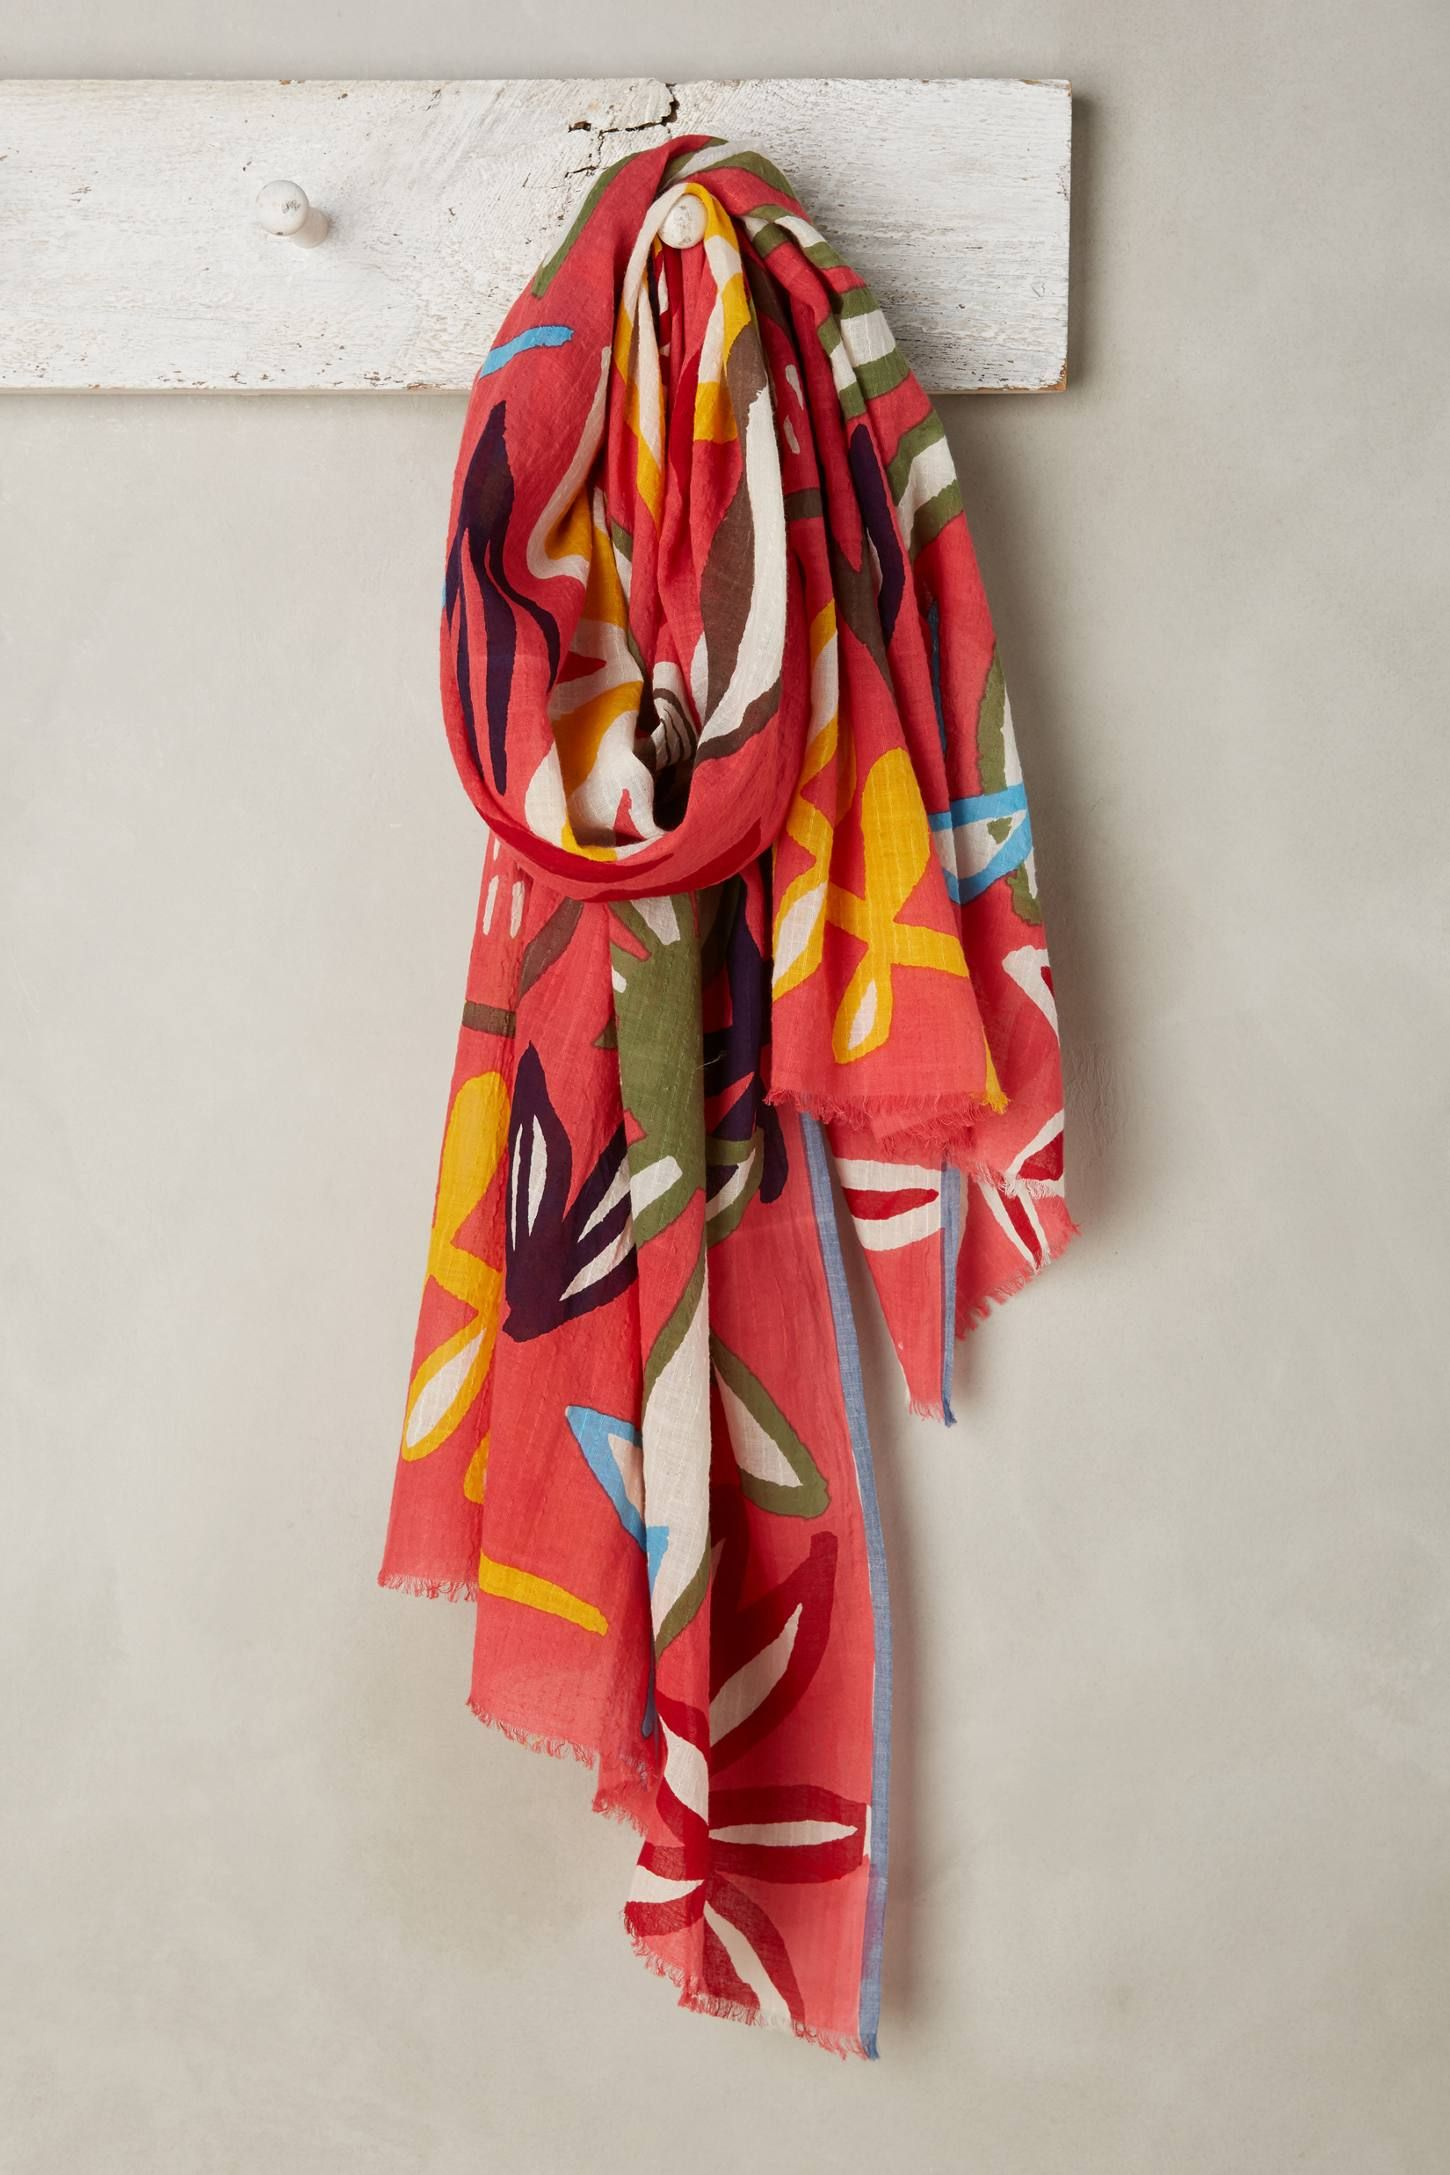 Modal Scarf - Tetris scarf by VIDA VIDA LJQwhA